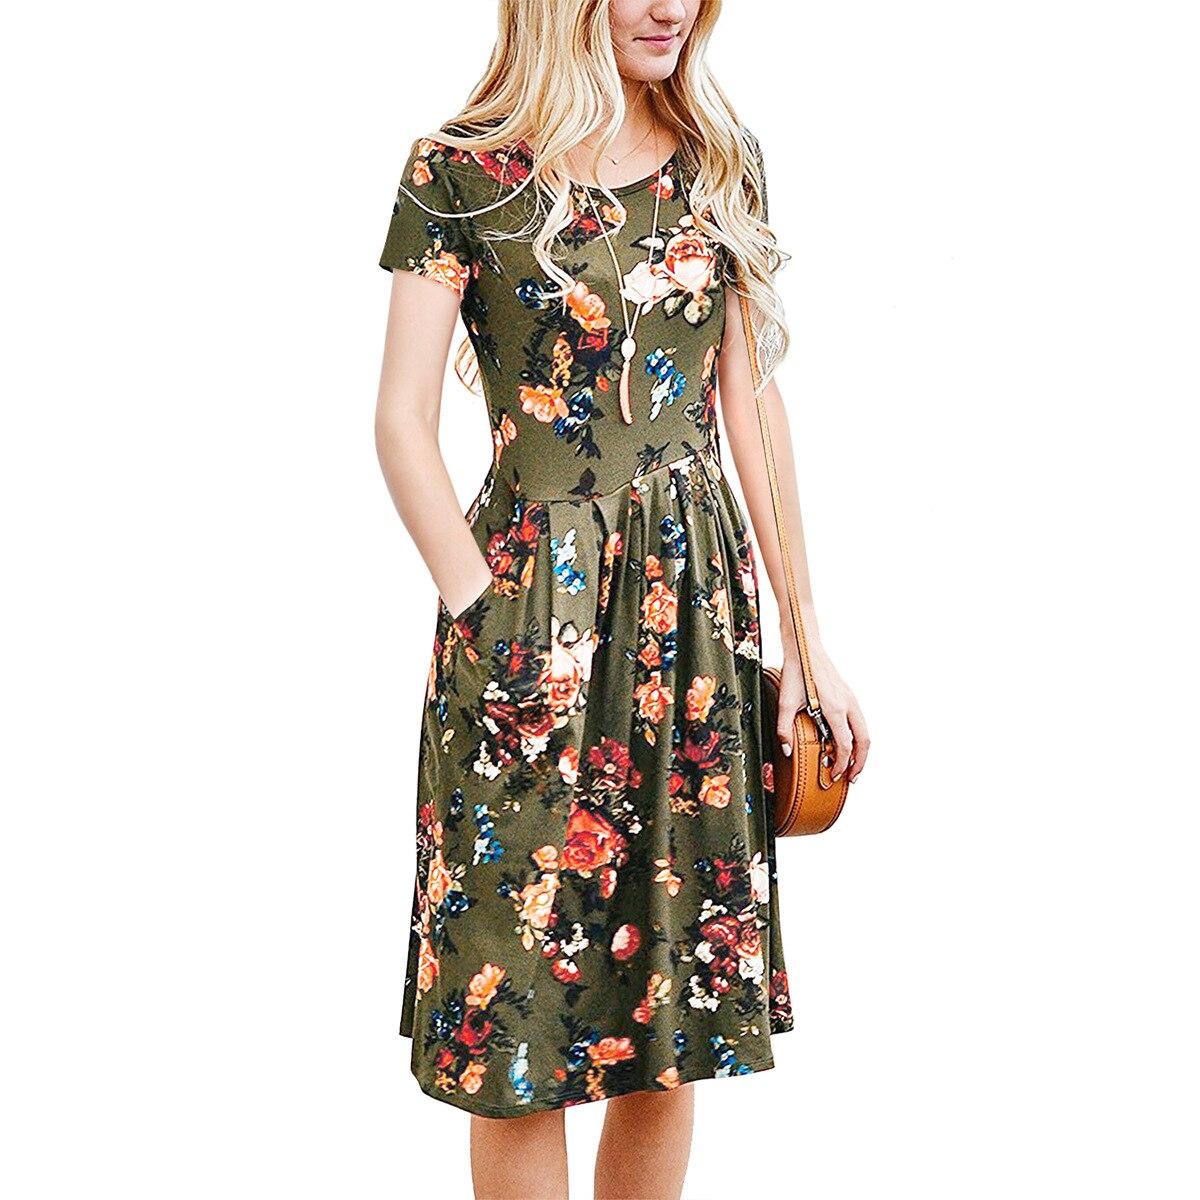 OUSIDI 2018 Sommar Kvinnor Mode Slim Elegant Party Dress Dam Casual - Damkläder